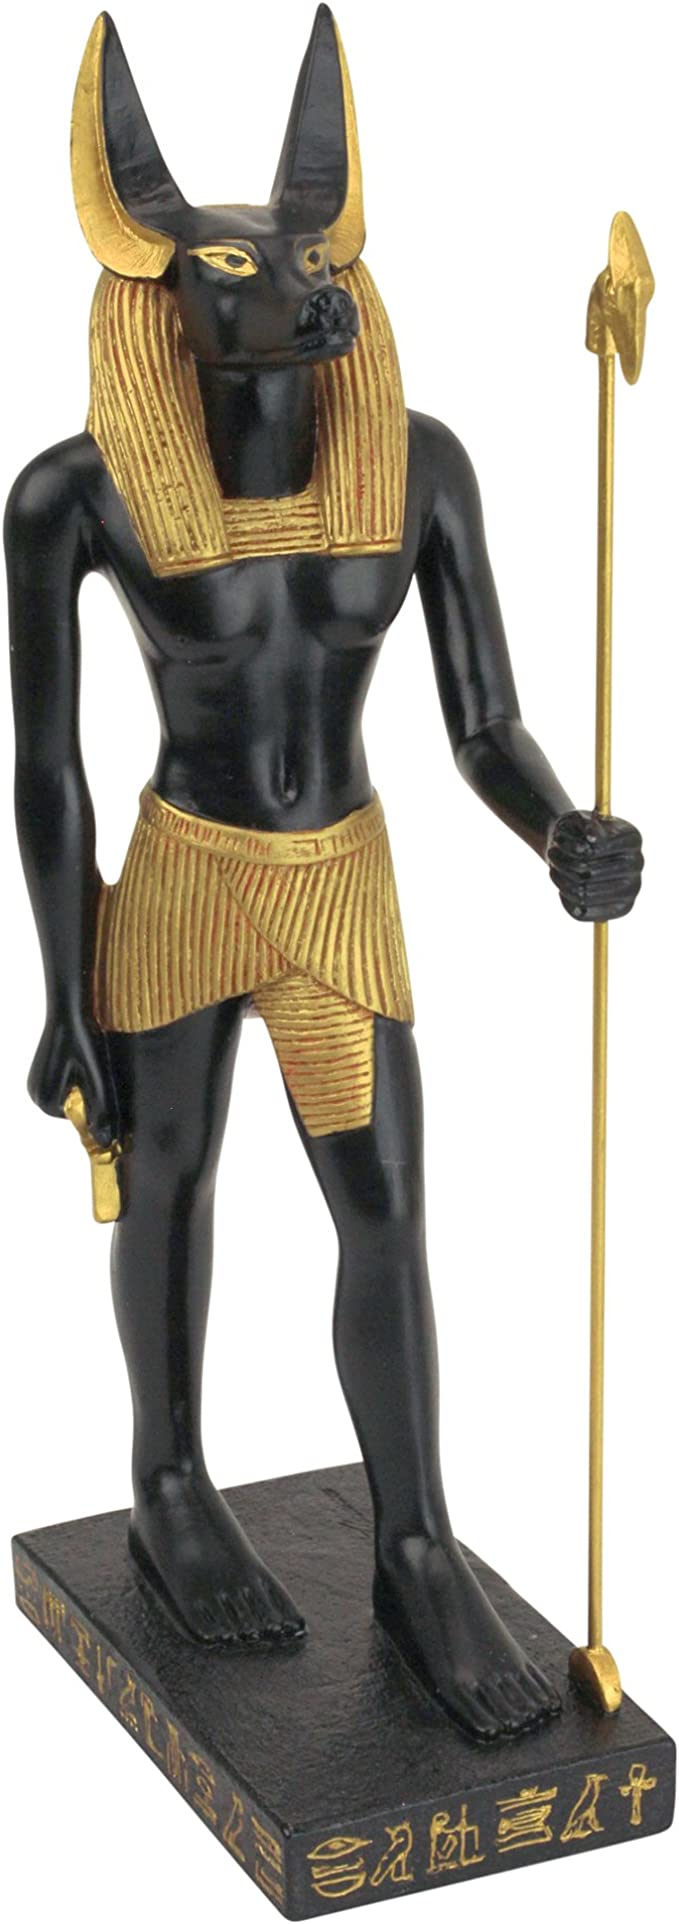 Design Toscano Anubis the Jackal God Wall Sculpture